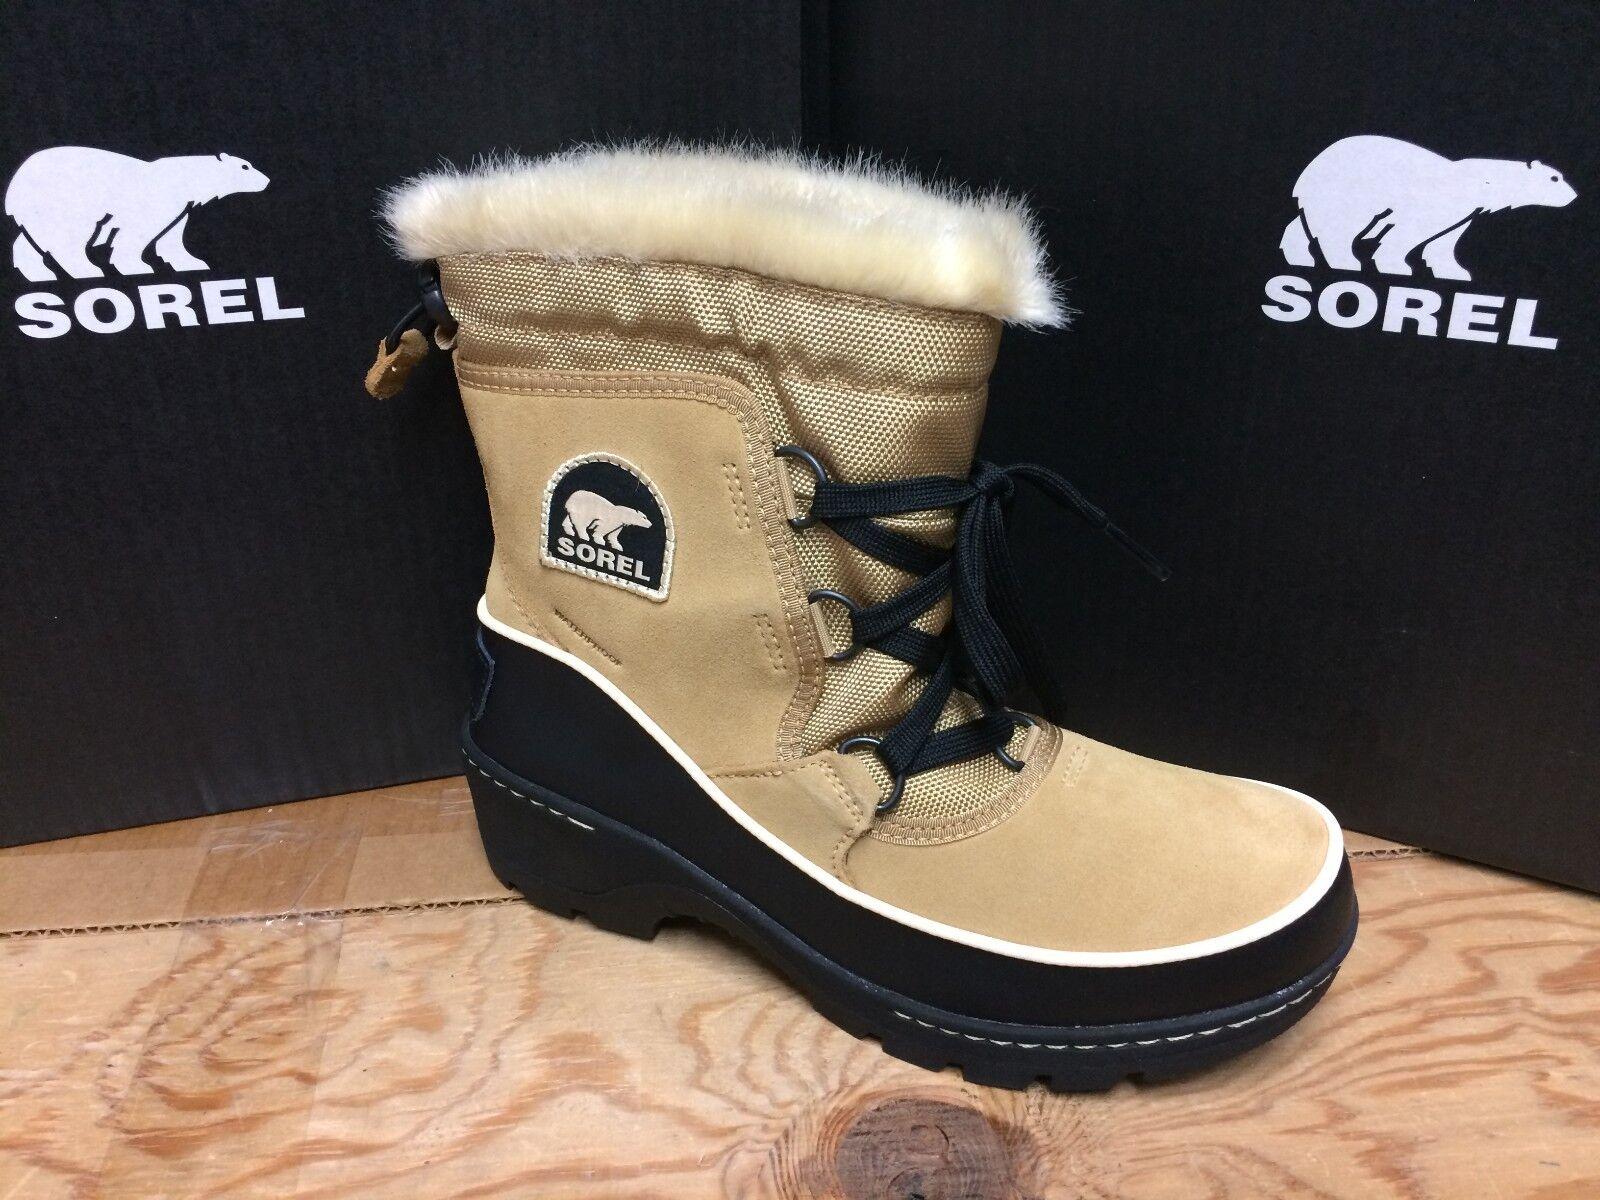 SOREL WOMEN'S TIVOLI Stiefel III  SNOW Stiefel TIVOLI NL2532-373 (1749361-373)CURRY BLACK 99dd37